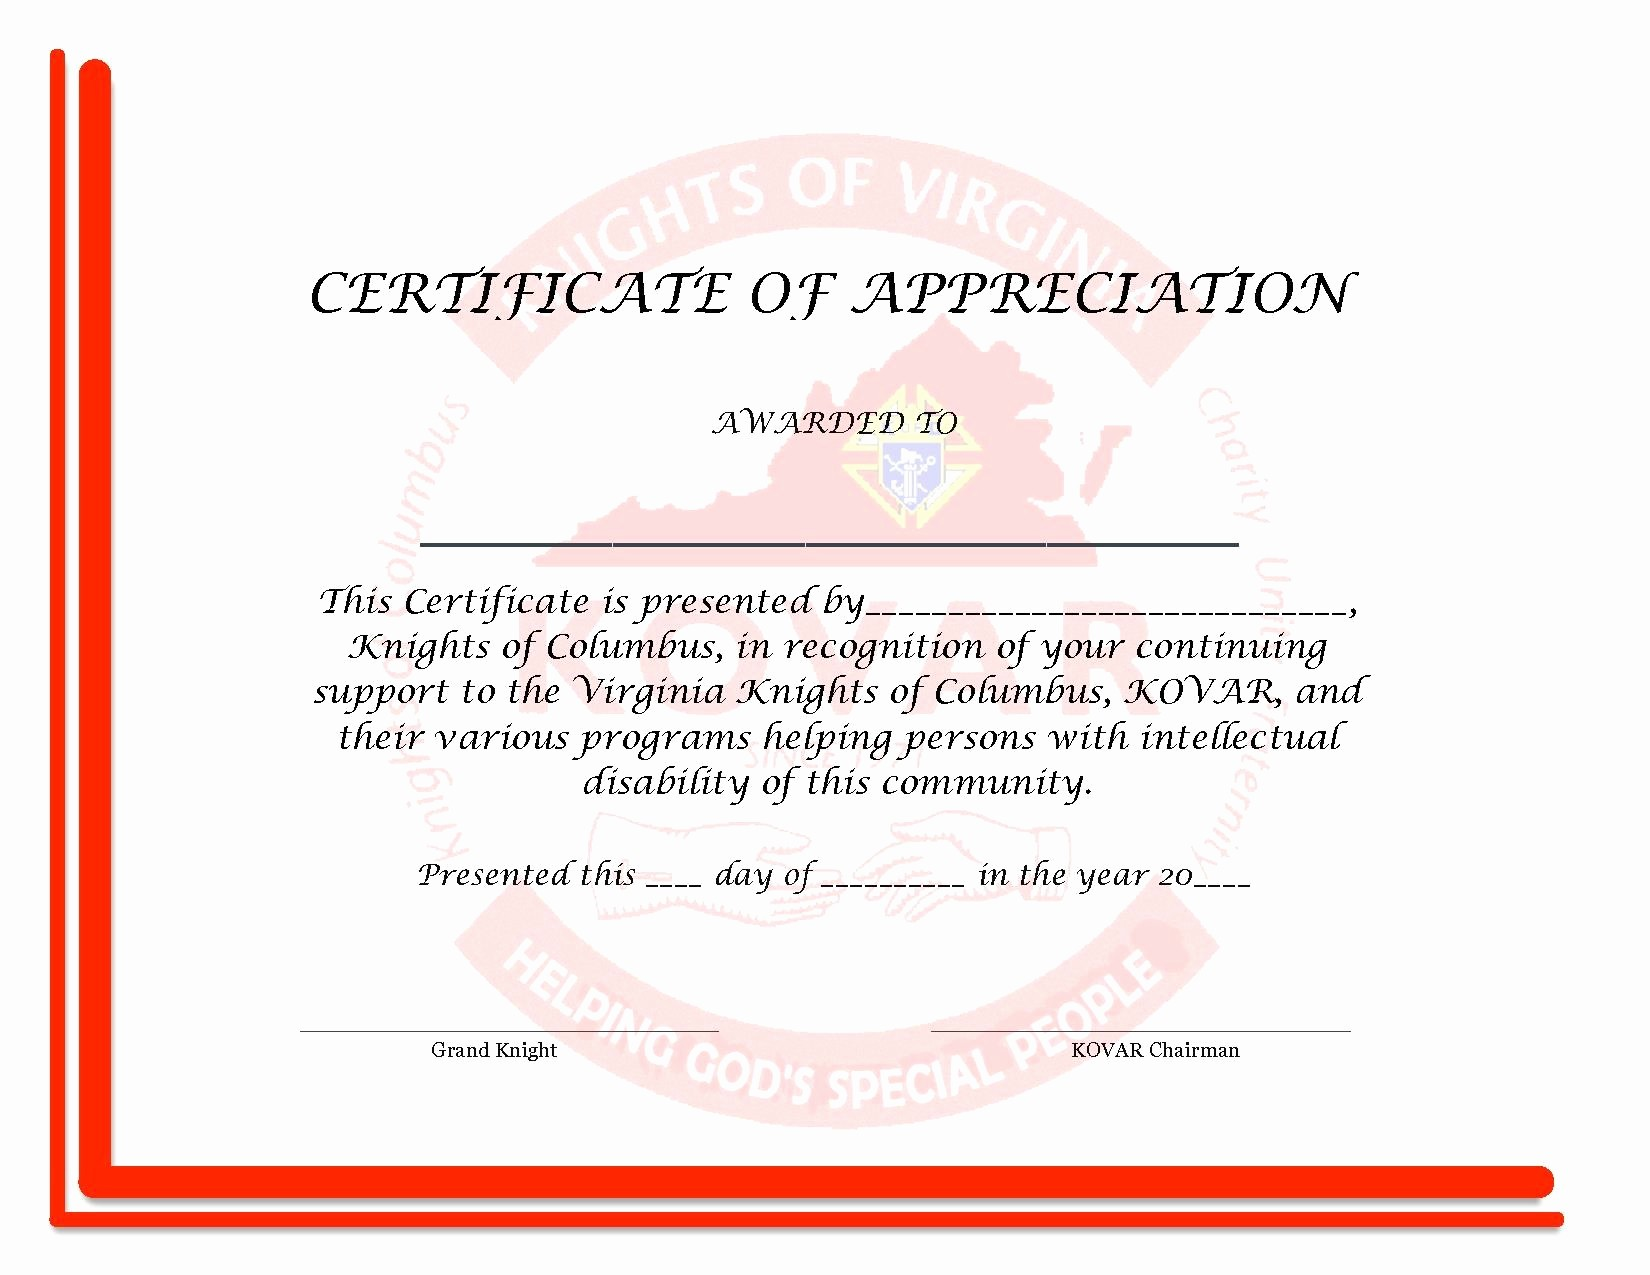 Template for Certificate Of Appreciation Lovely Certificate Appreciation Template